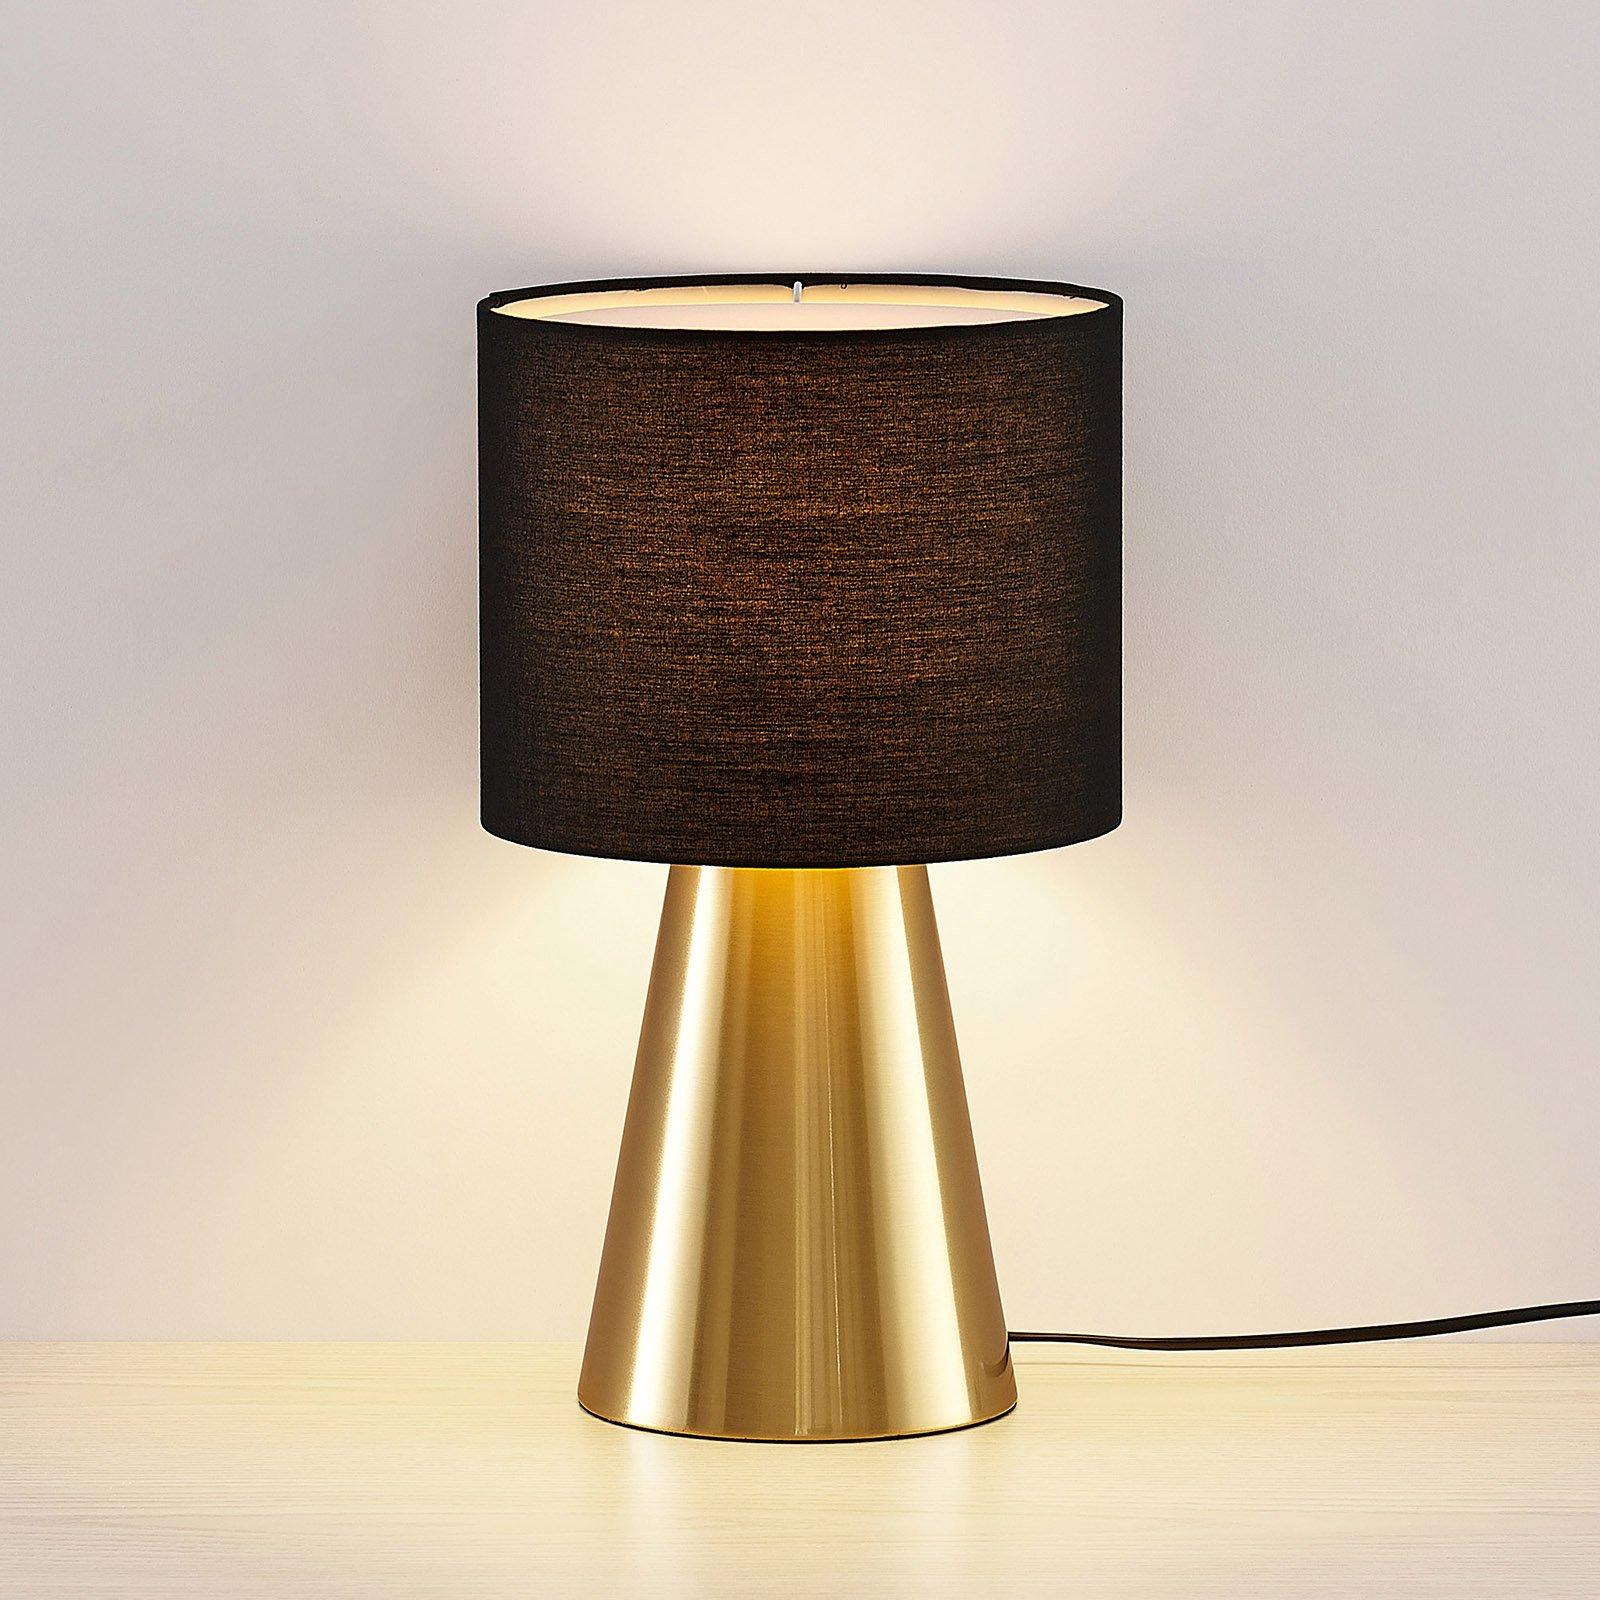 Lindby Erantie bordlampe i svart/hvitt